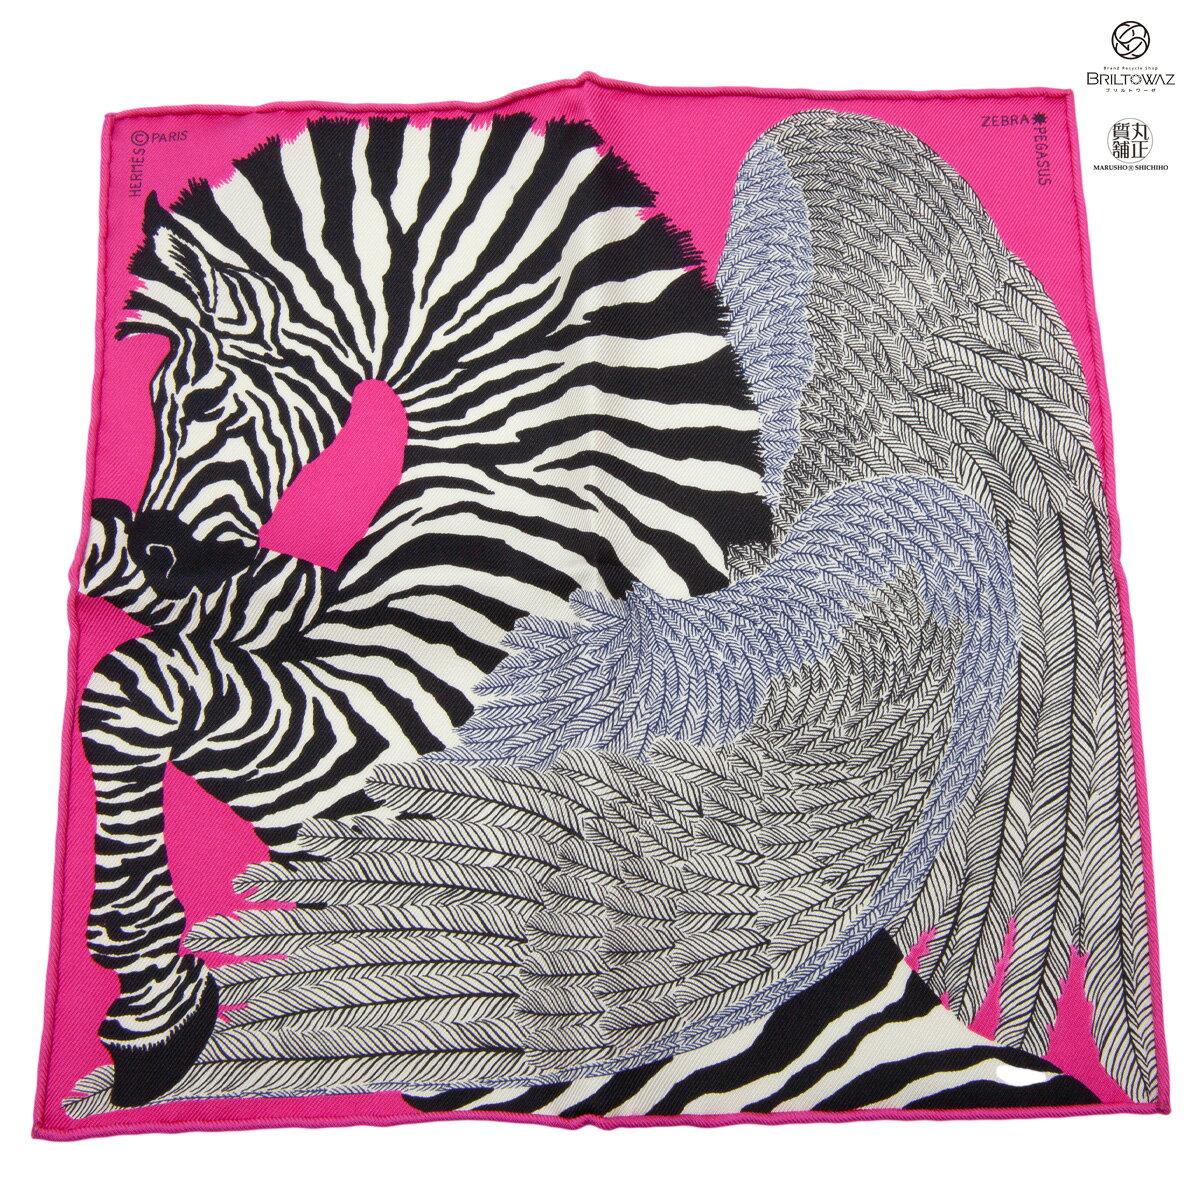 HERMES zebra pegasus scarf 20 ZEBRA PEGASUS 2020...